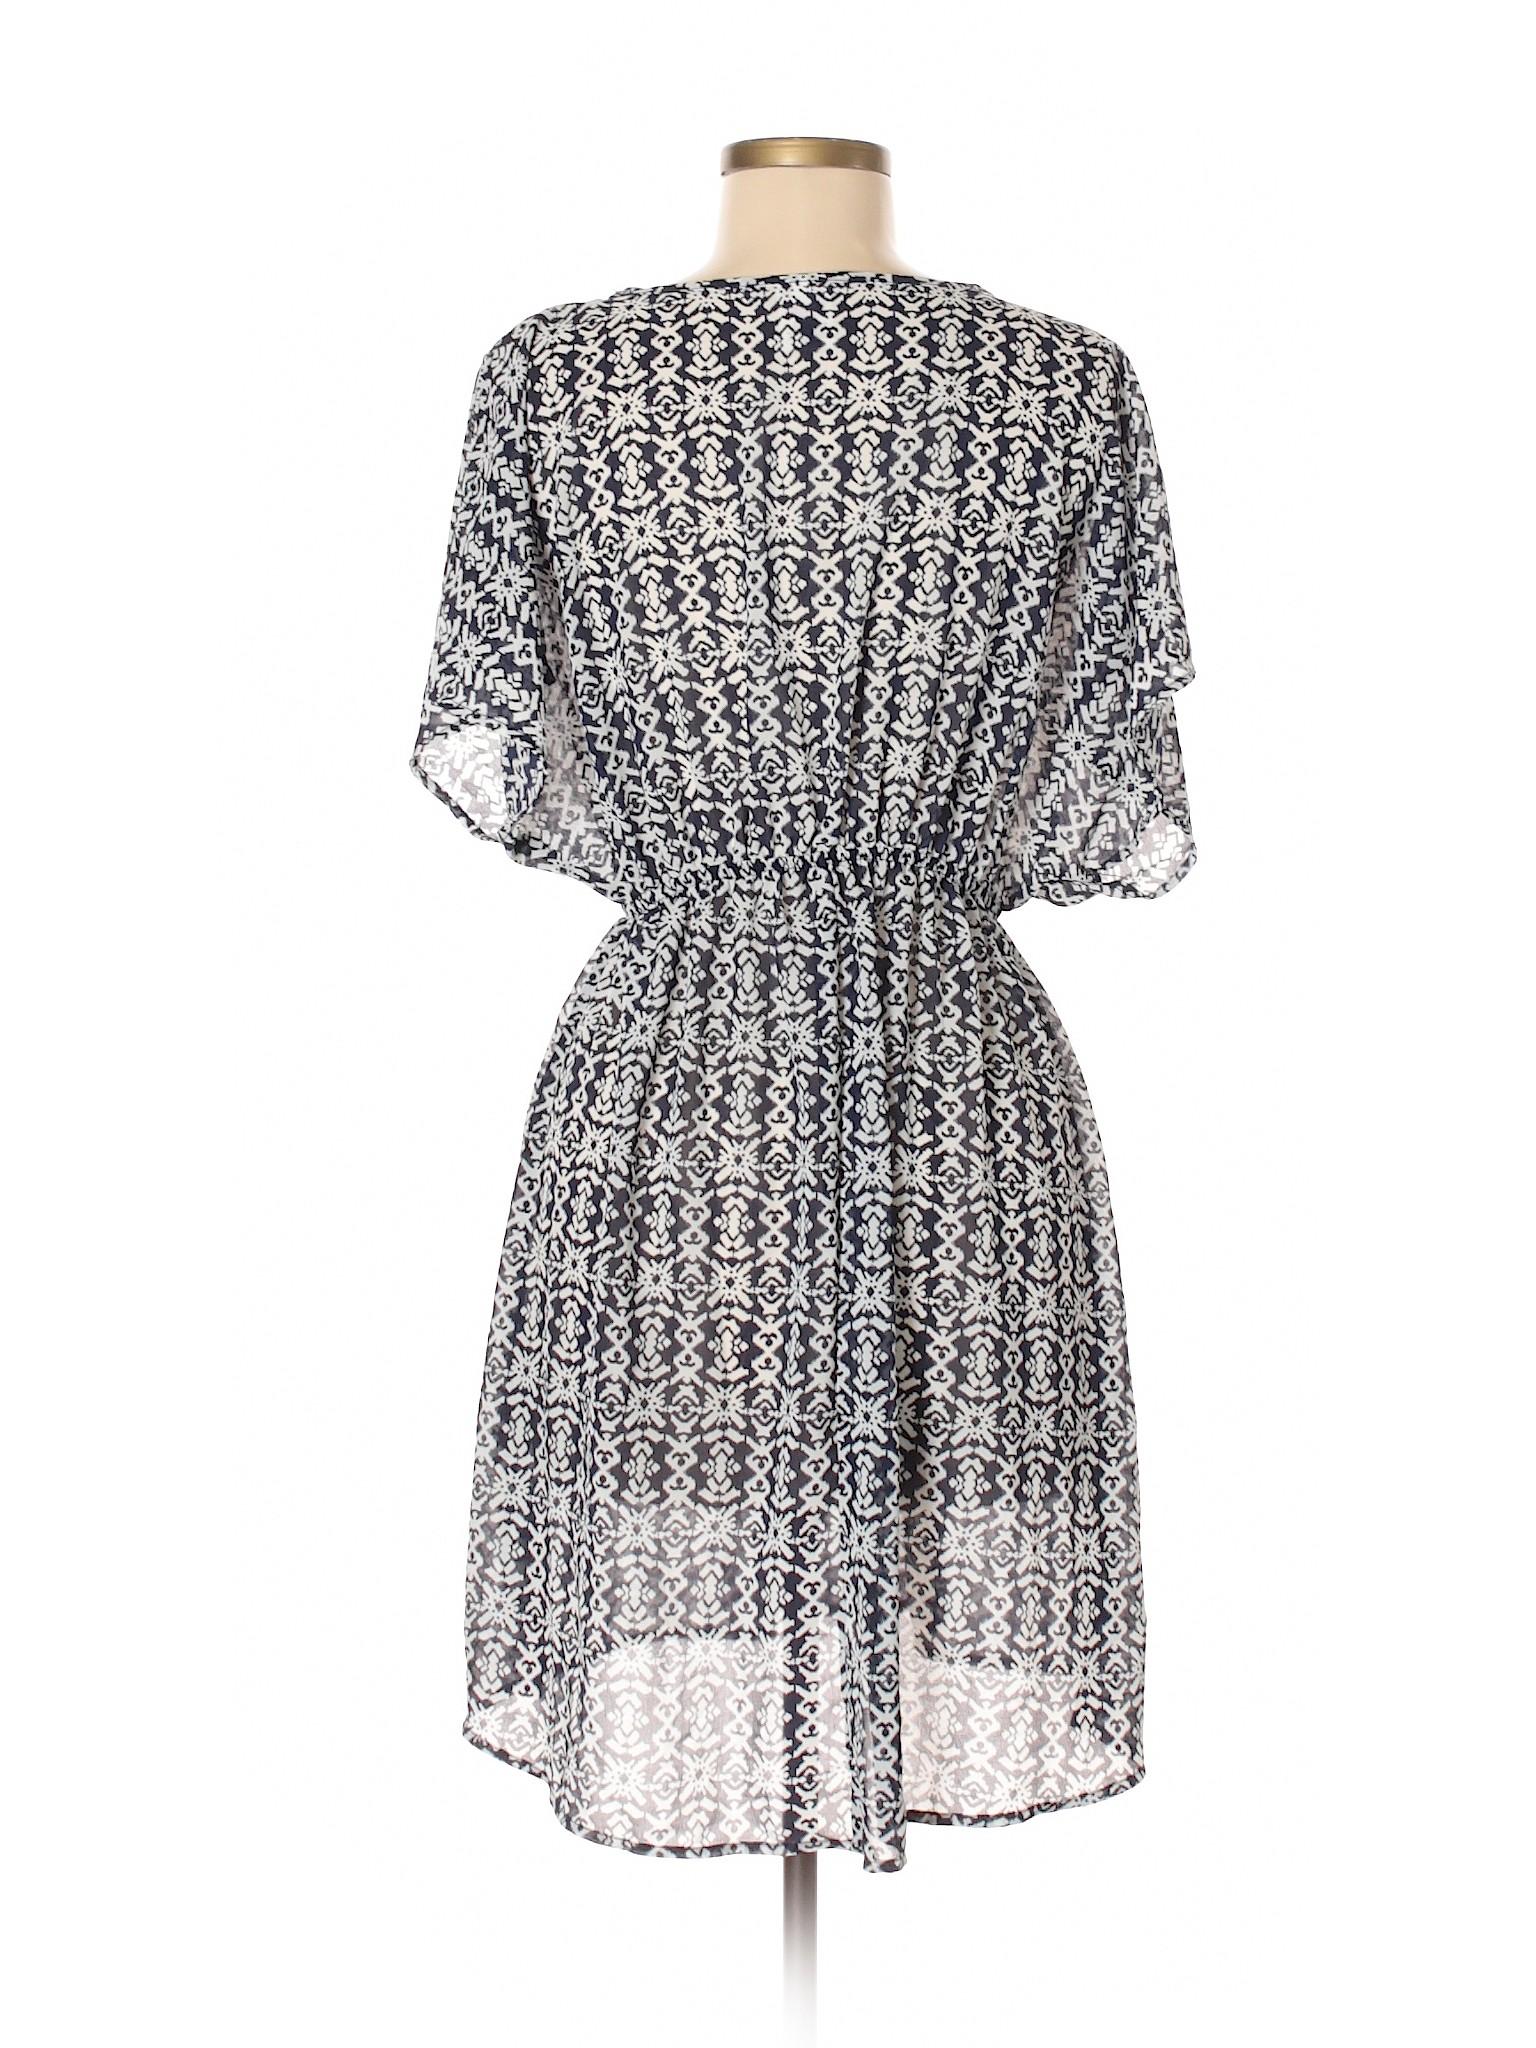 Merona winter Dress Merona Boutique winter Casual Dress Casual Boutique Pq1dwZxxp